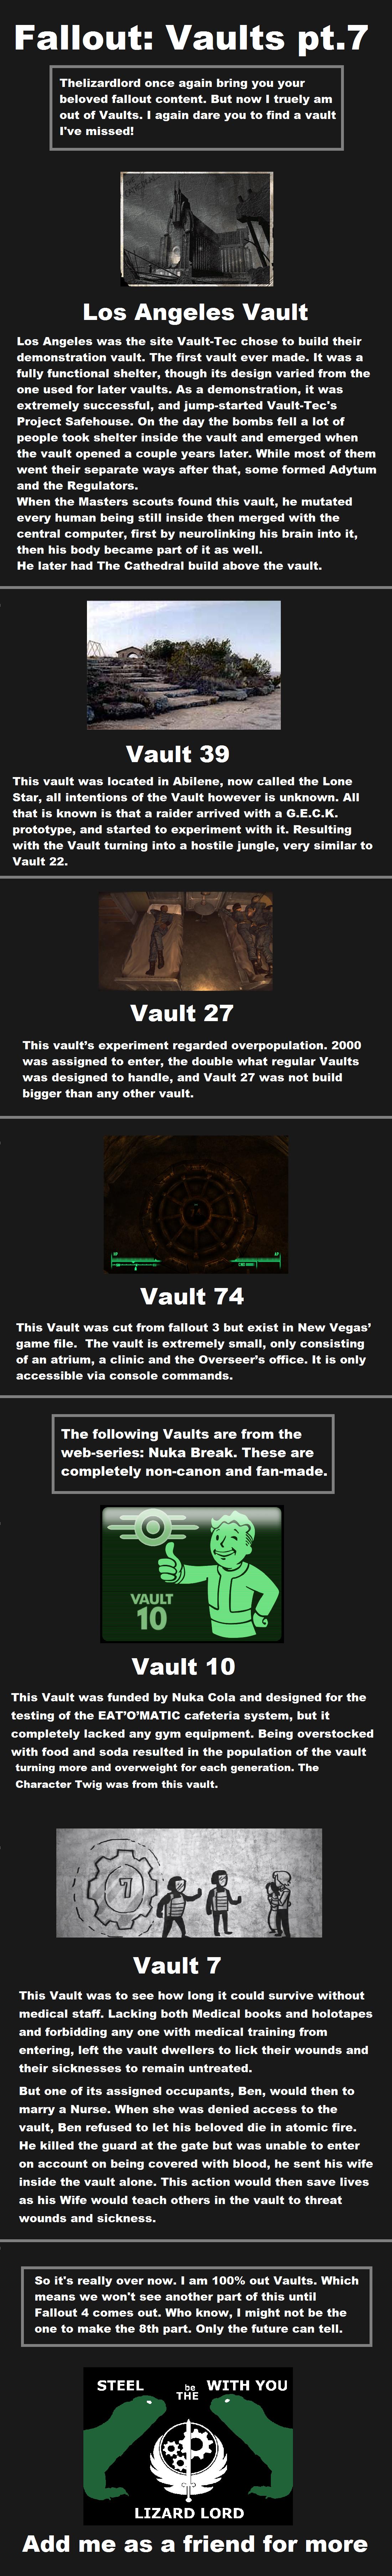 Fallout: Vaults pt7. Part one: /Fallout+Vaults/funny-pictures/4957769/ Part two: /Fallout+Vaults+Pt.2/funny-pictures/4... Part three: /channel/fallout/Fallout+V Fallout The Master Super mutants raider nuka break nuka cola